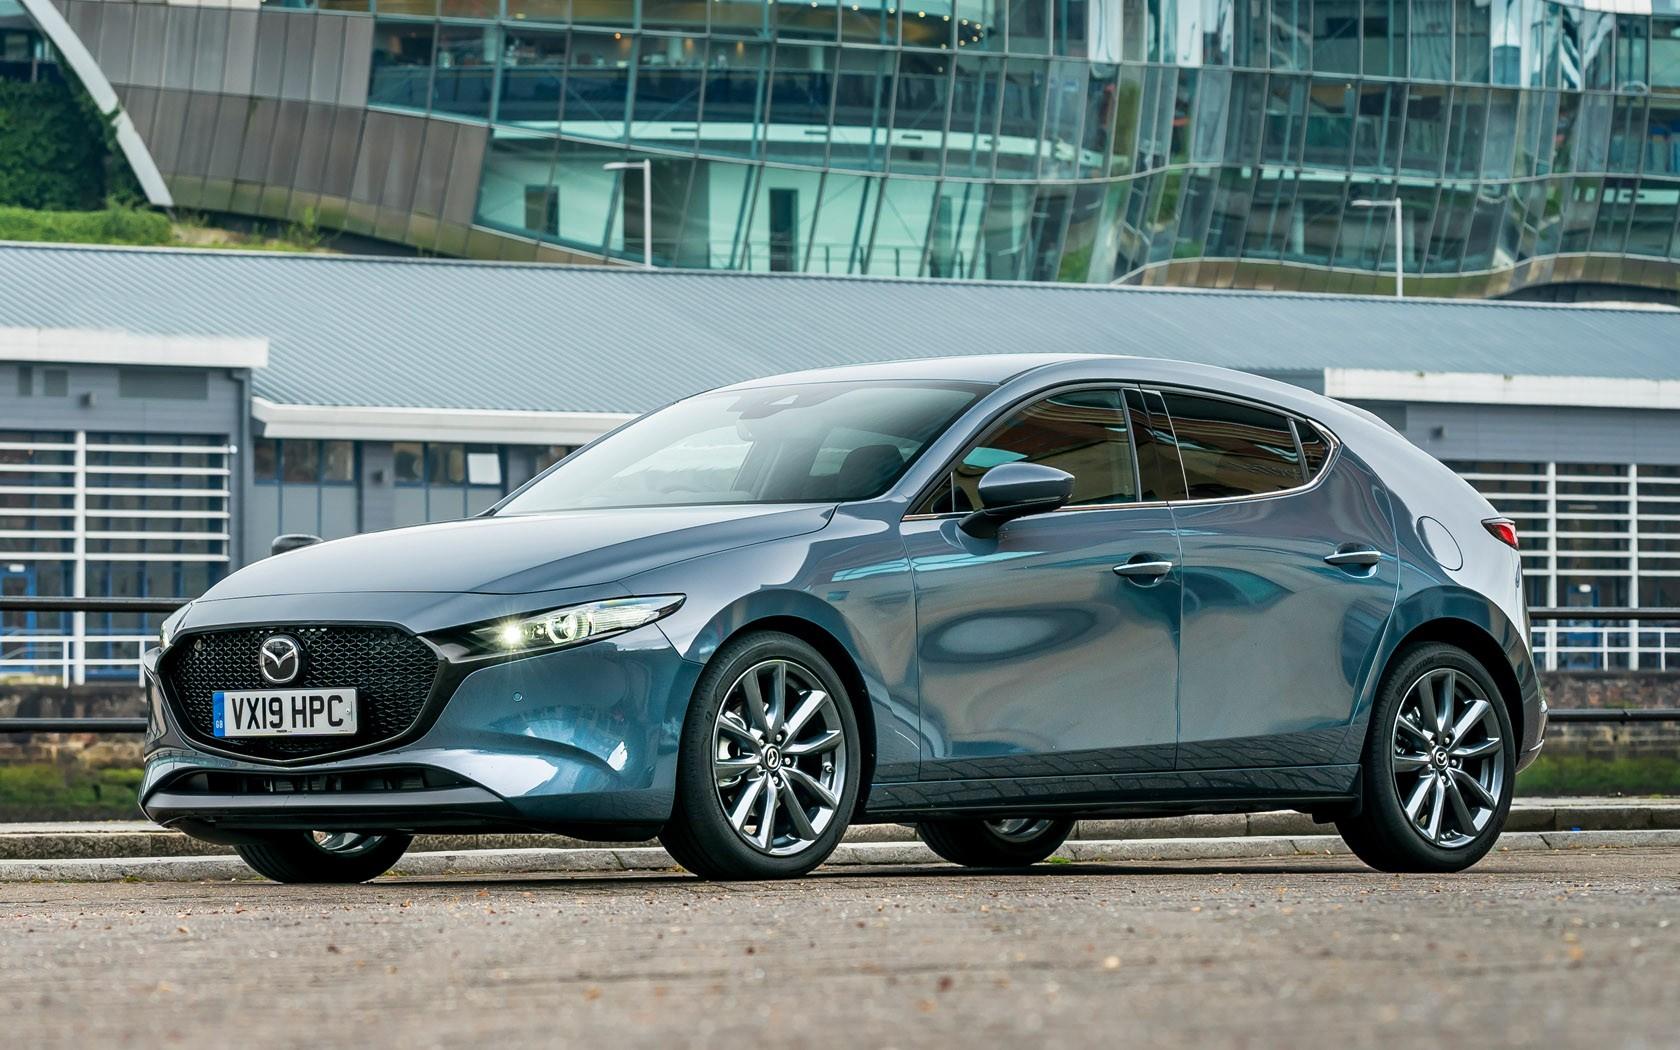 Kekurangan Mazda Skyactive Perbandingan Harga